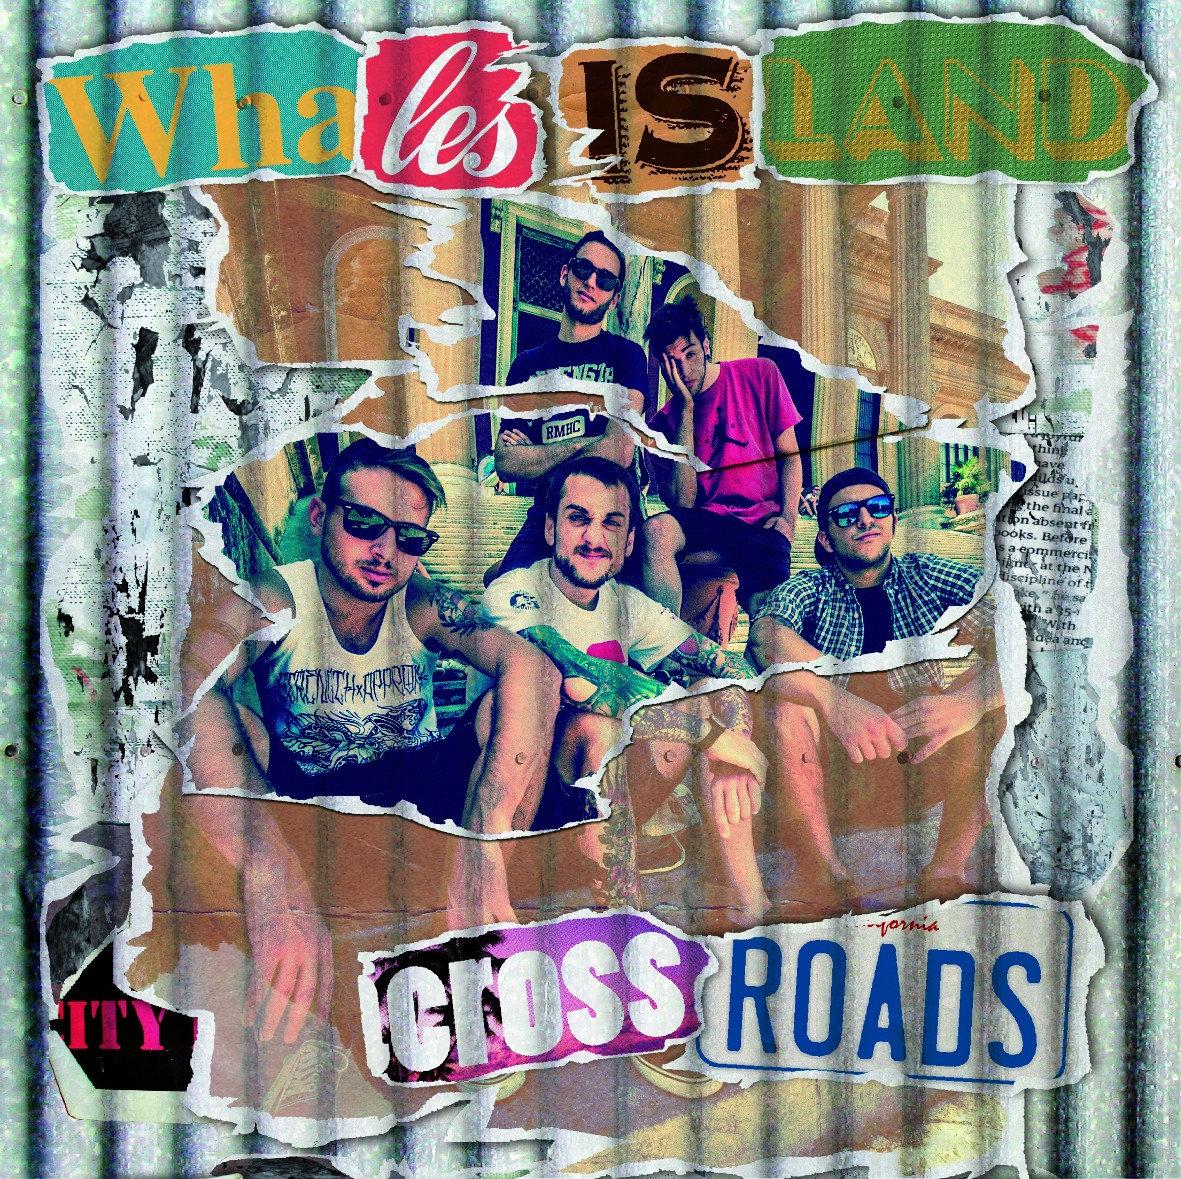 Whales Island - Crossroads 7